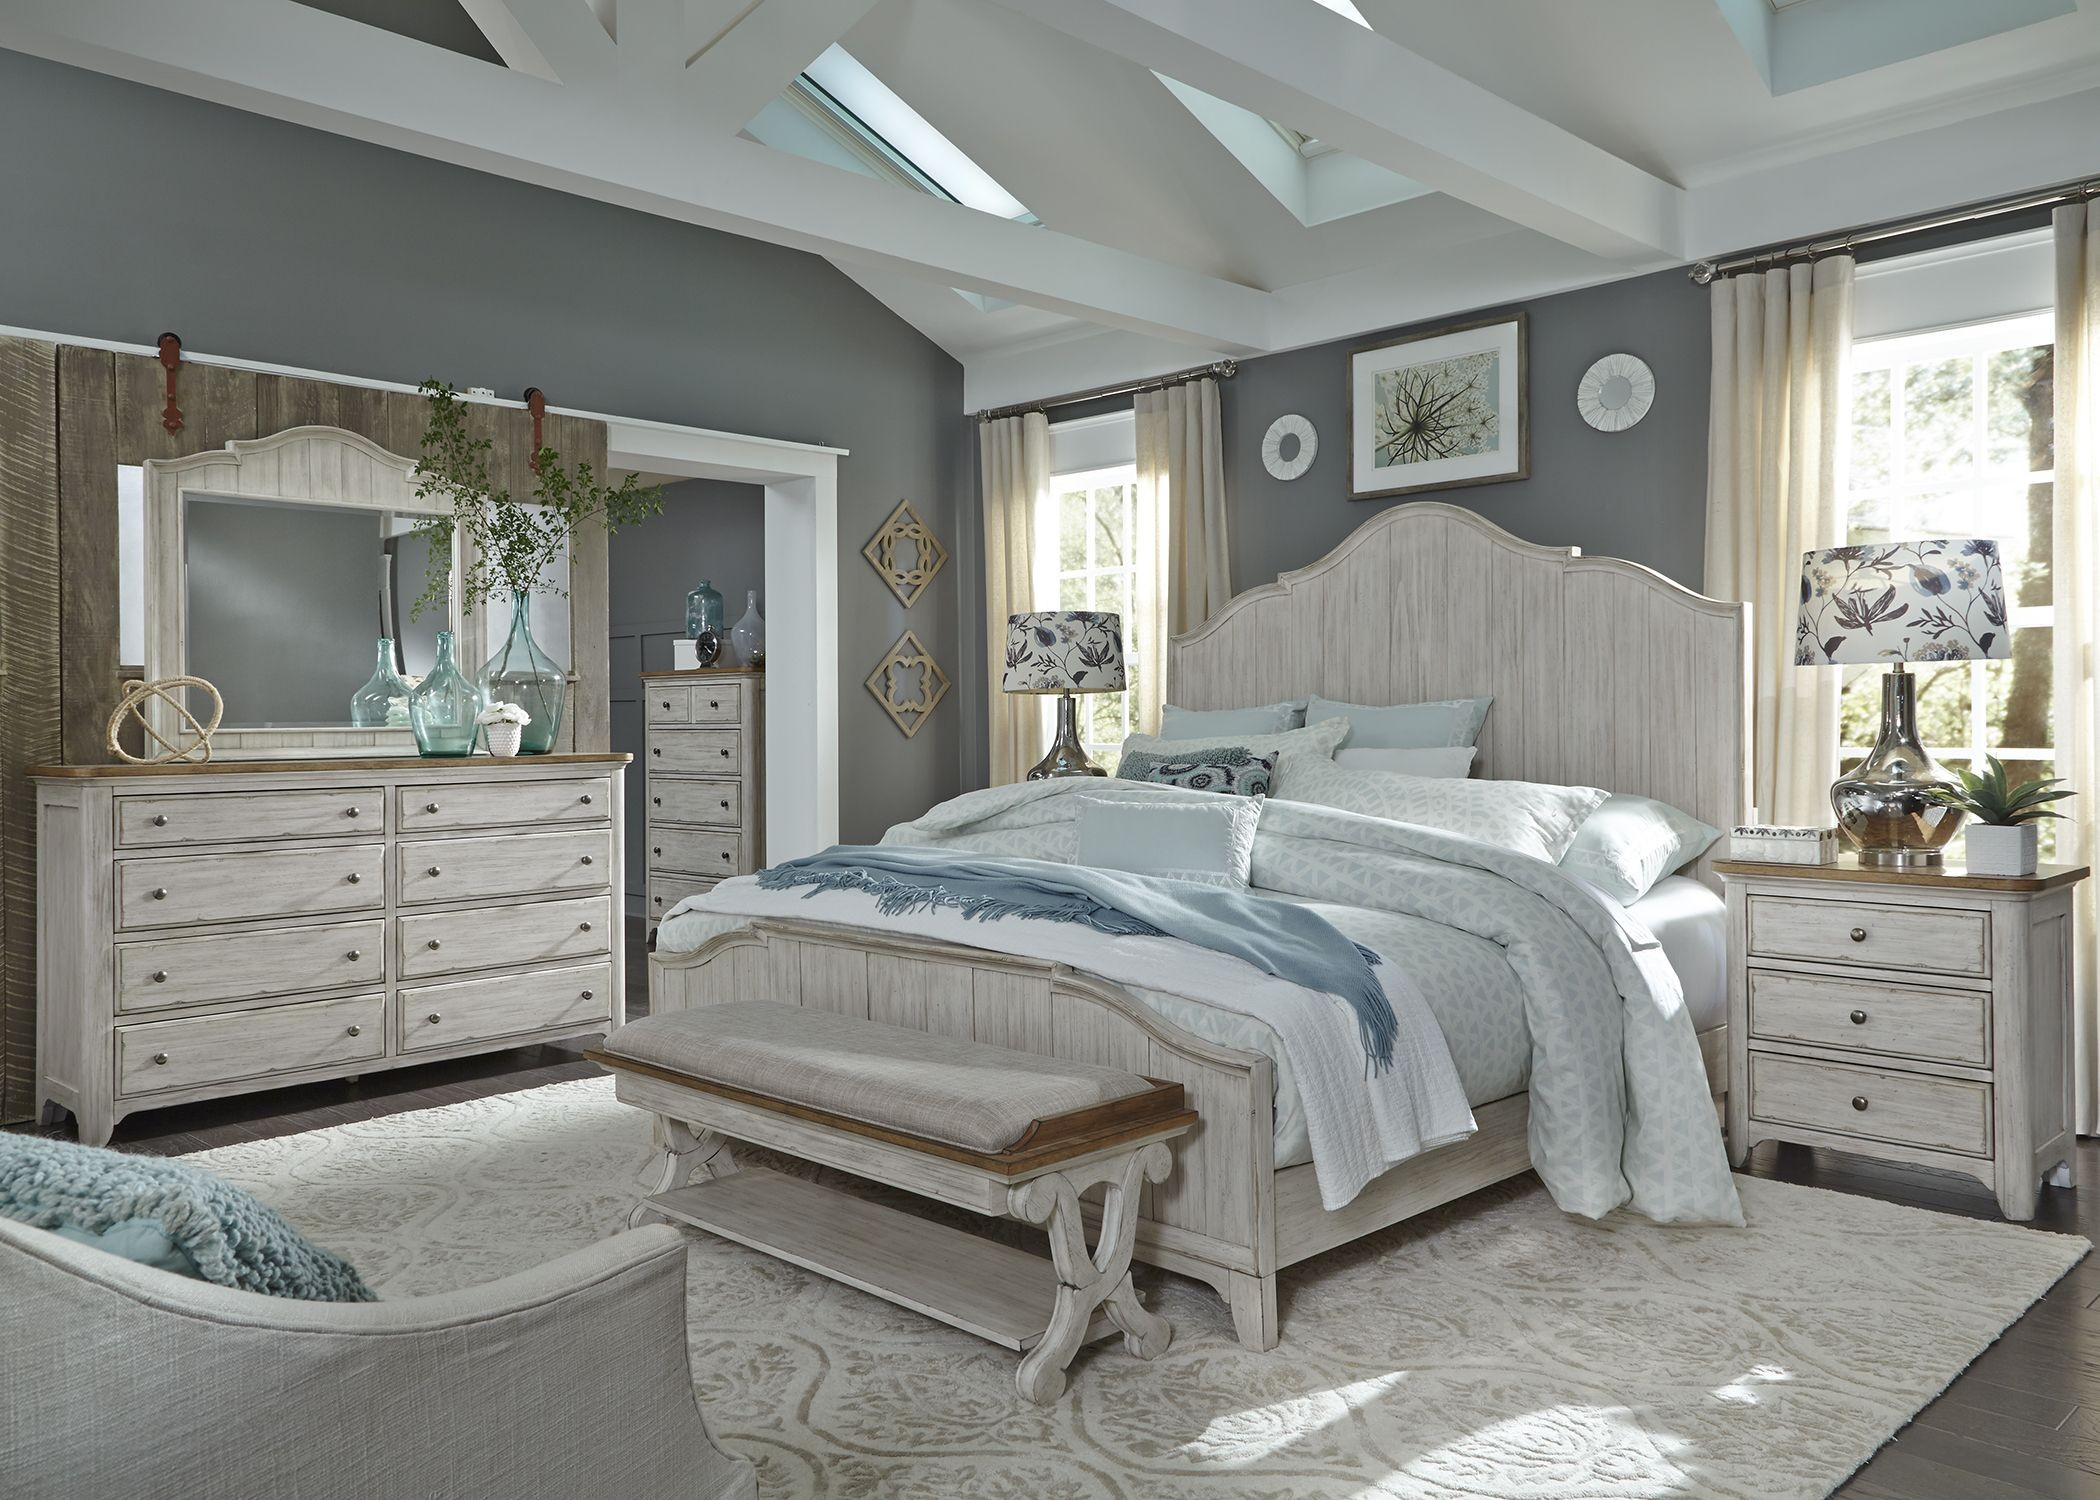 Liberty Farmhouse Reimagined Antique White Bed Bench Farmhouse